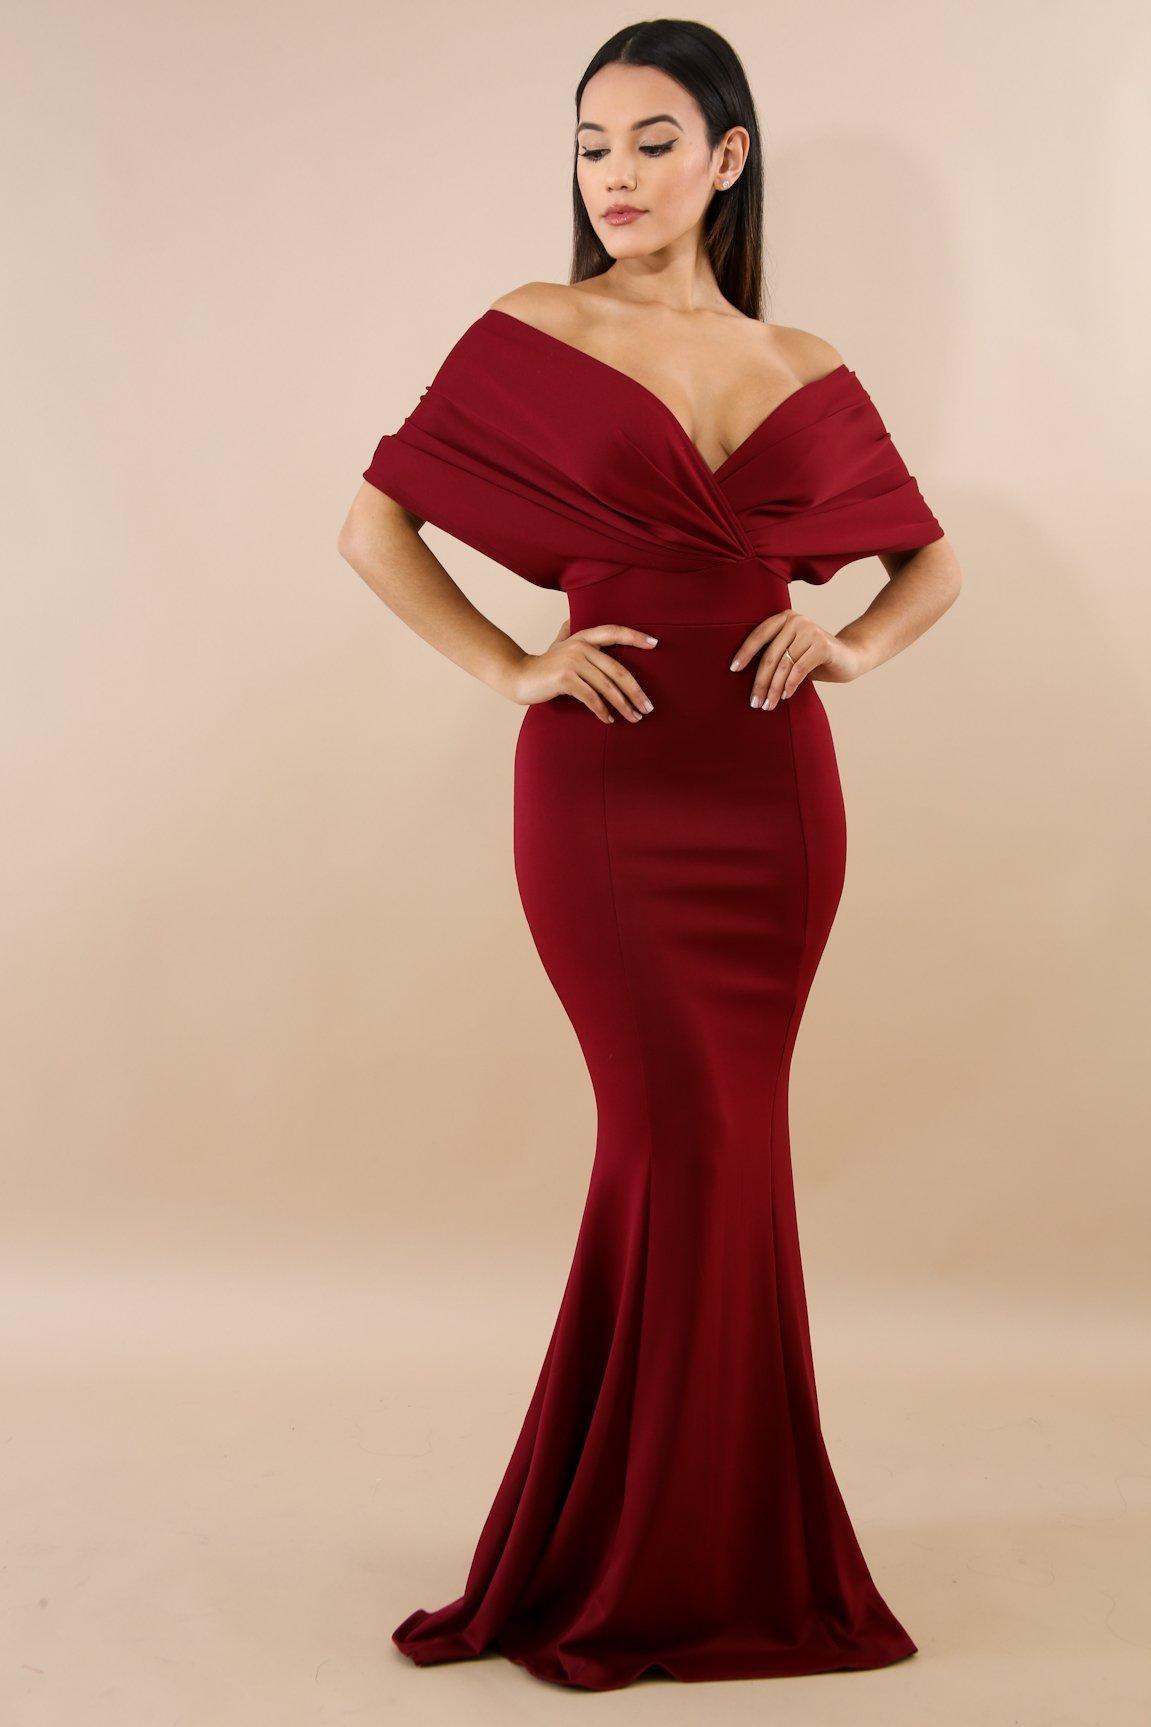 Elegance Glam Maxi Dress Formal Dresses Prom Glam Maxi Dress Elegant Dresses [ 1727 x 1151 Pixel ]